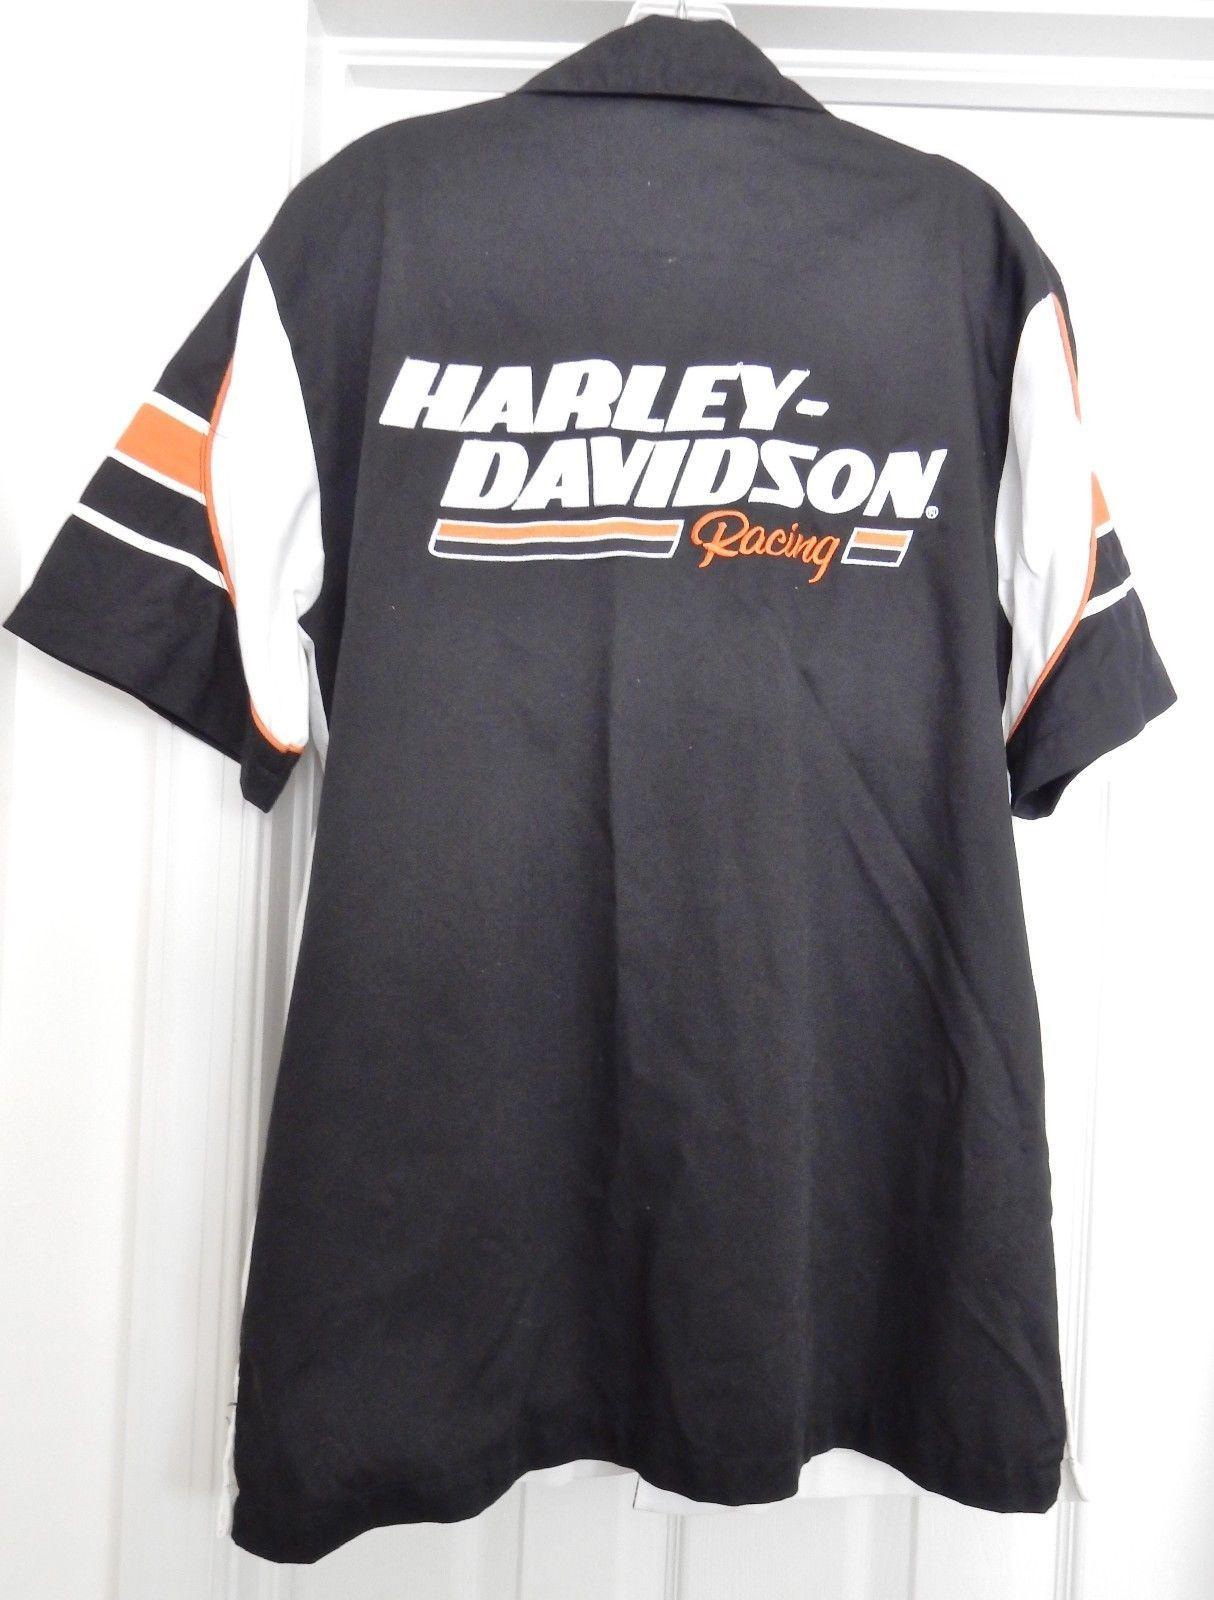 Harley-Davidson Racing Screamin' Eagle Garage Shirt Top S/S Cotton Blend Size M image 2